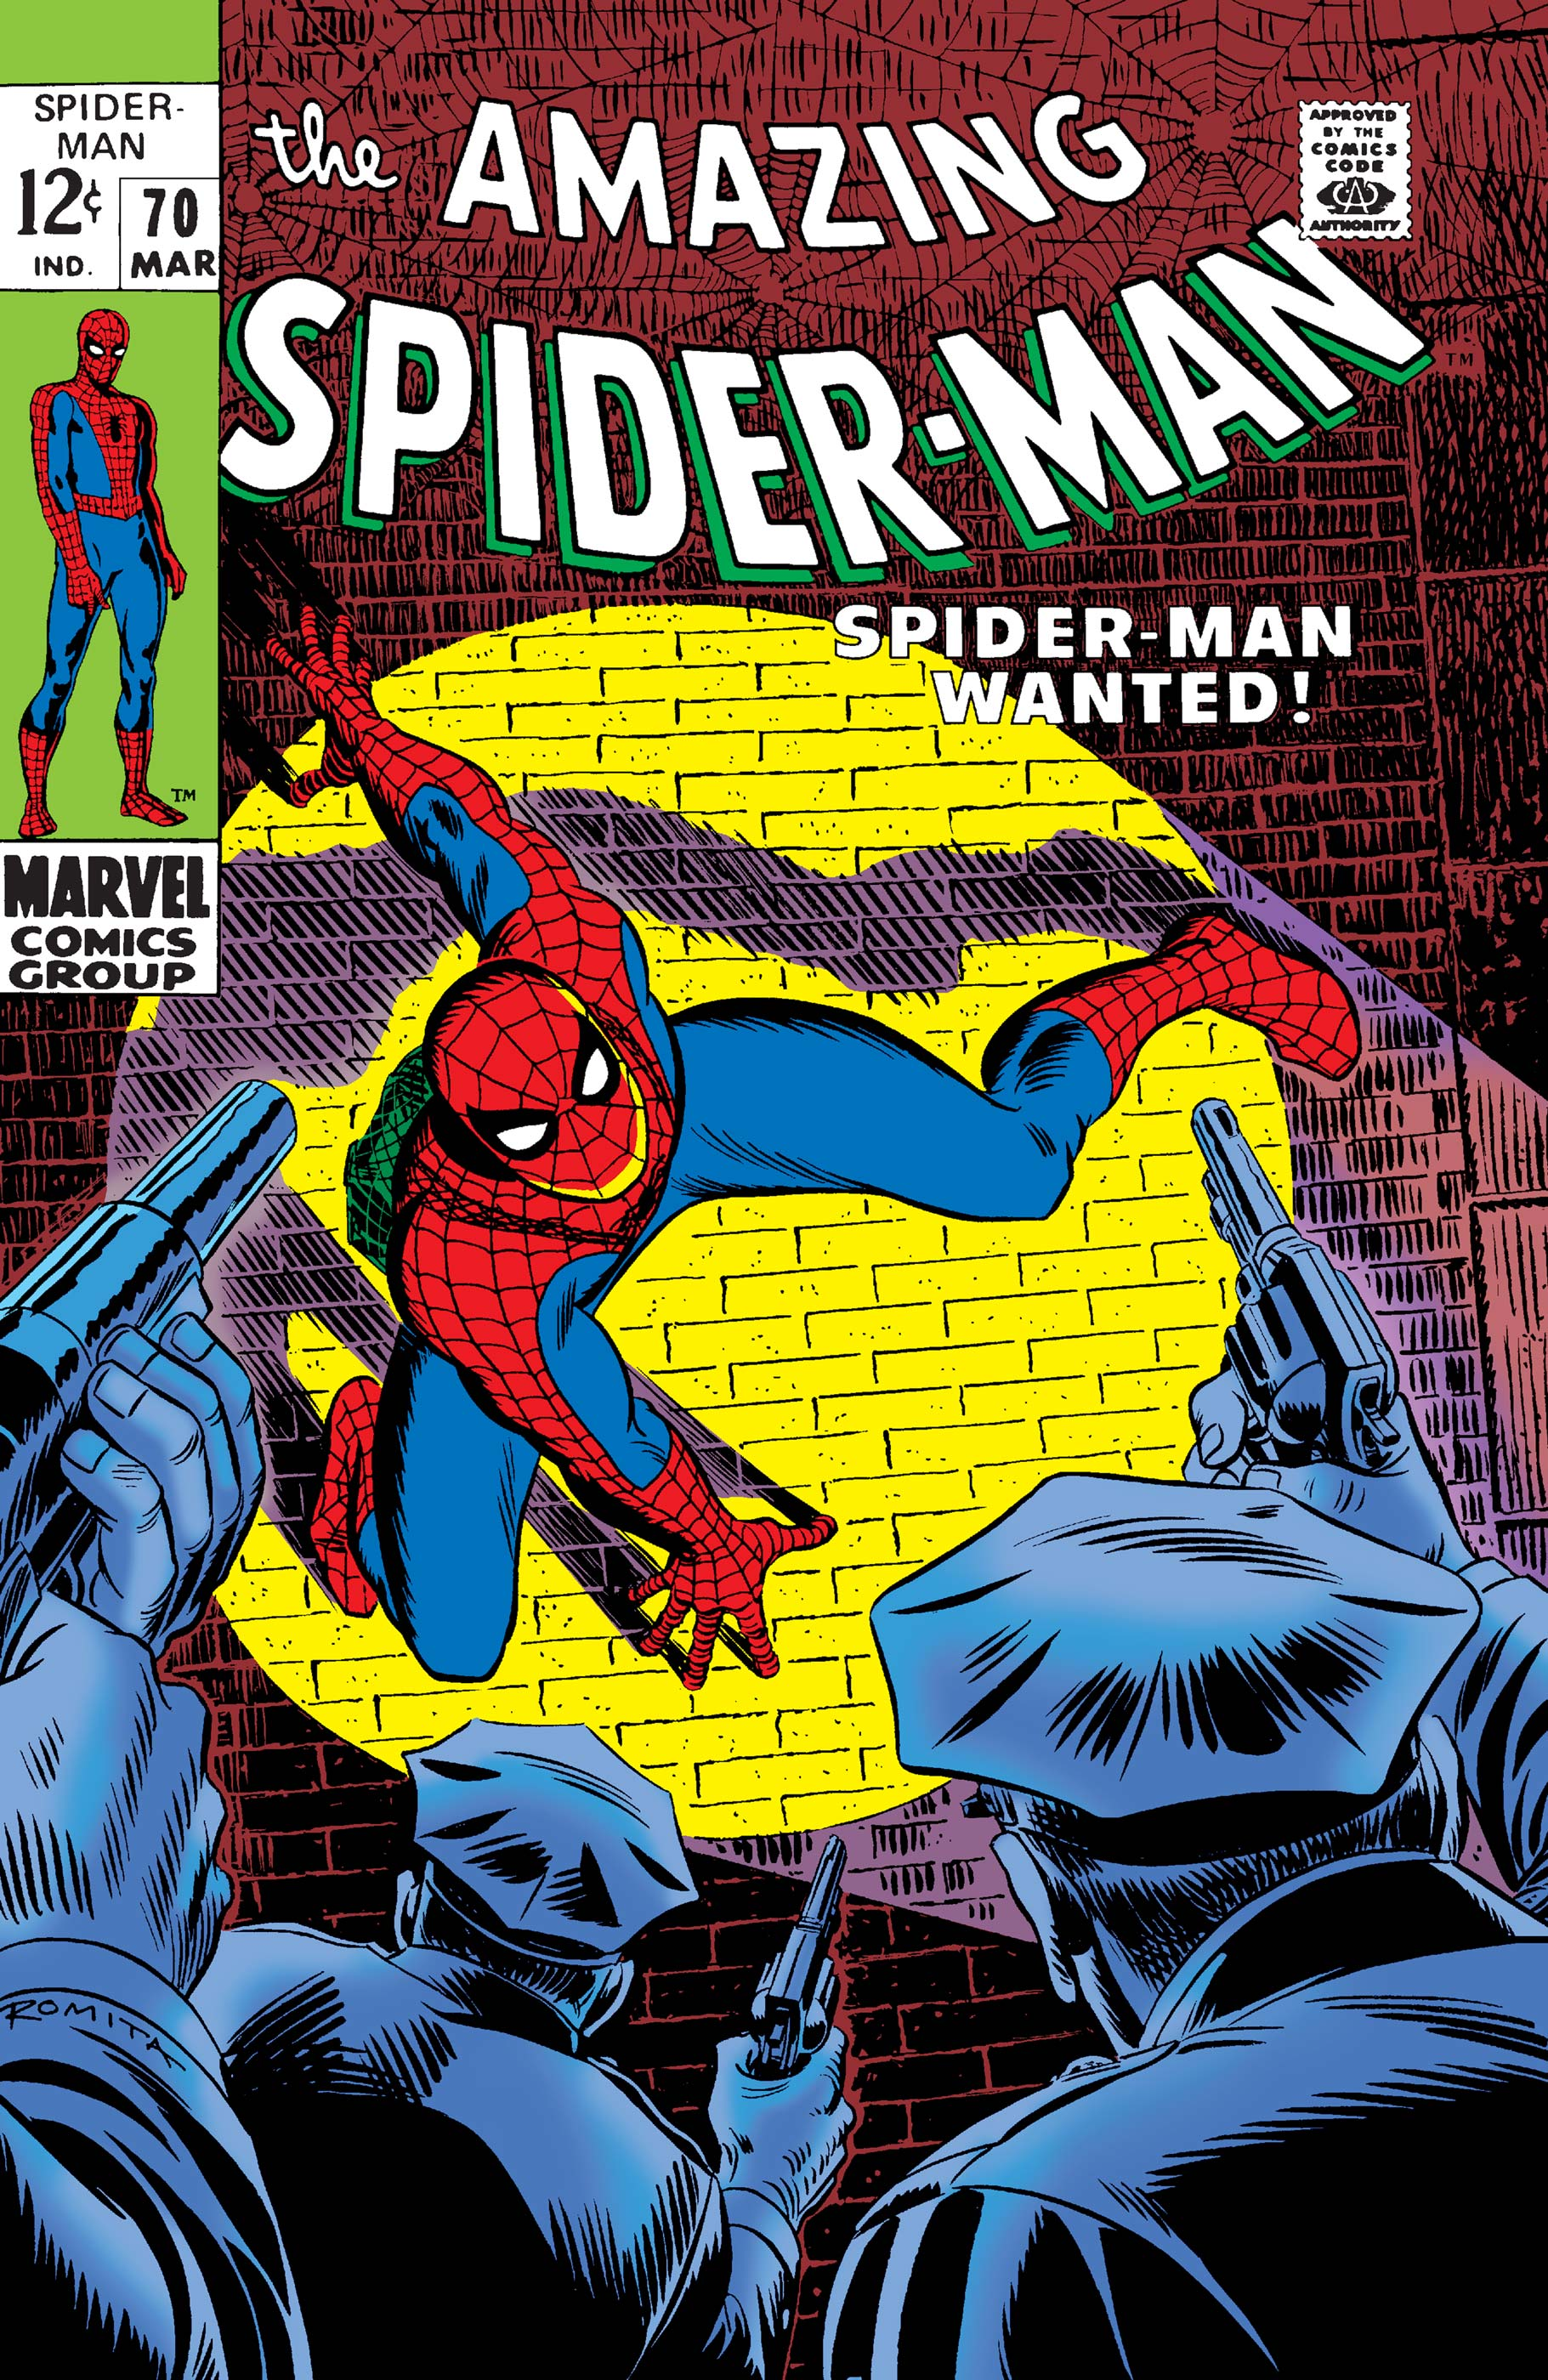 The Amazing Spider-Man (1963) #70